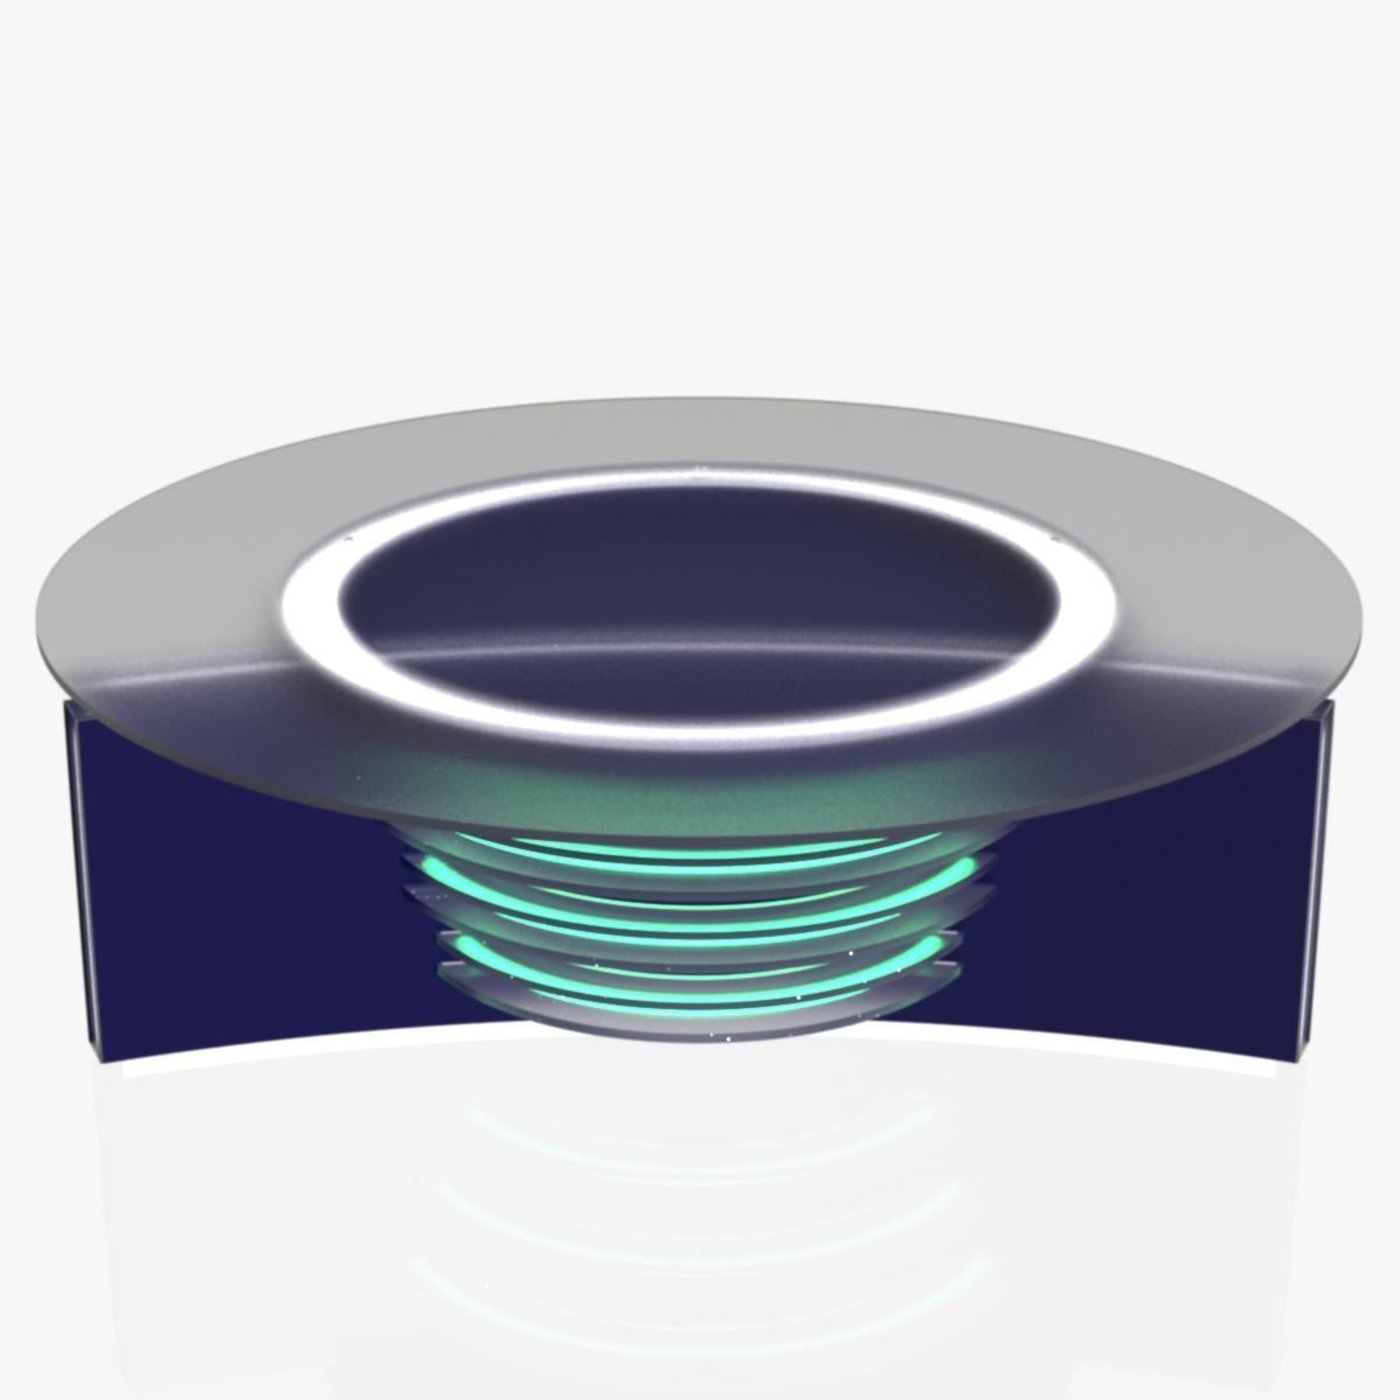 3D TV Studio News Desk 6